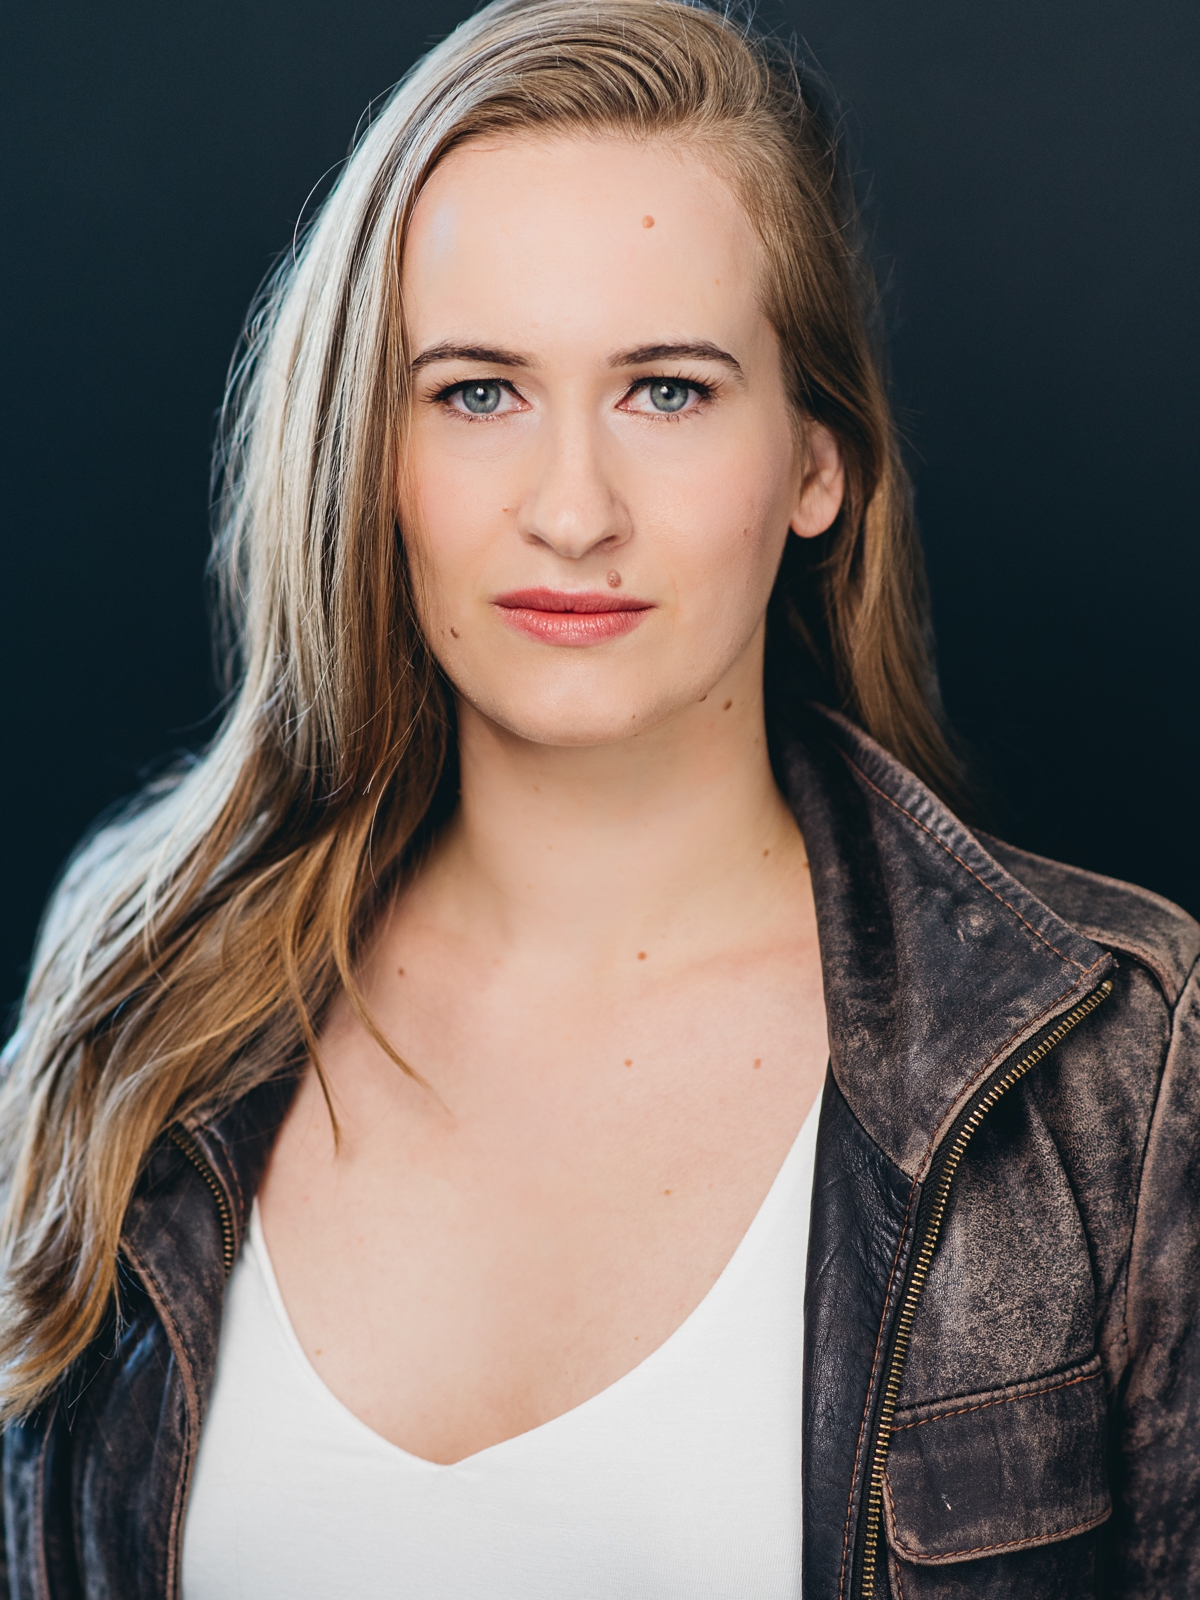 CarolineSawyer-LVIMAGERY-8.JPG